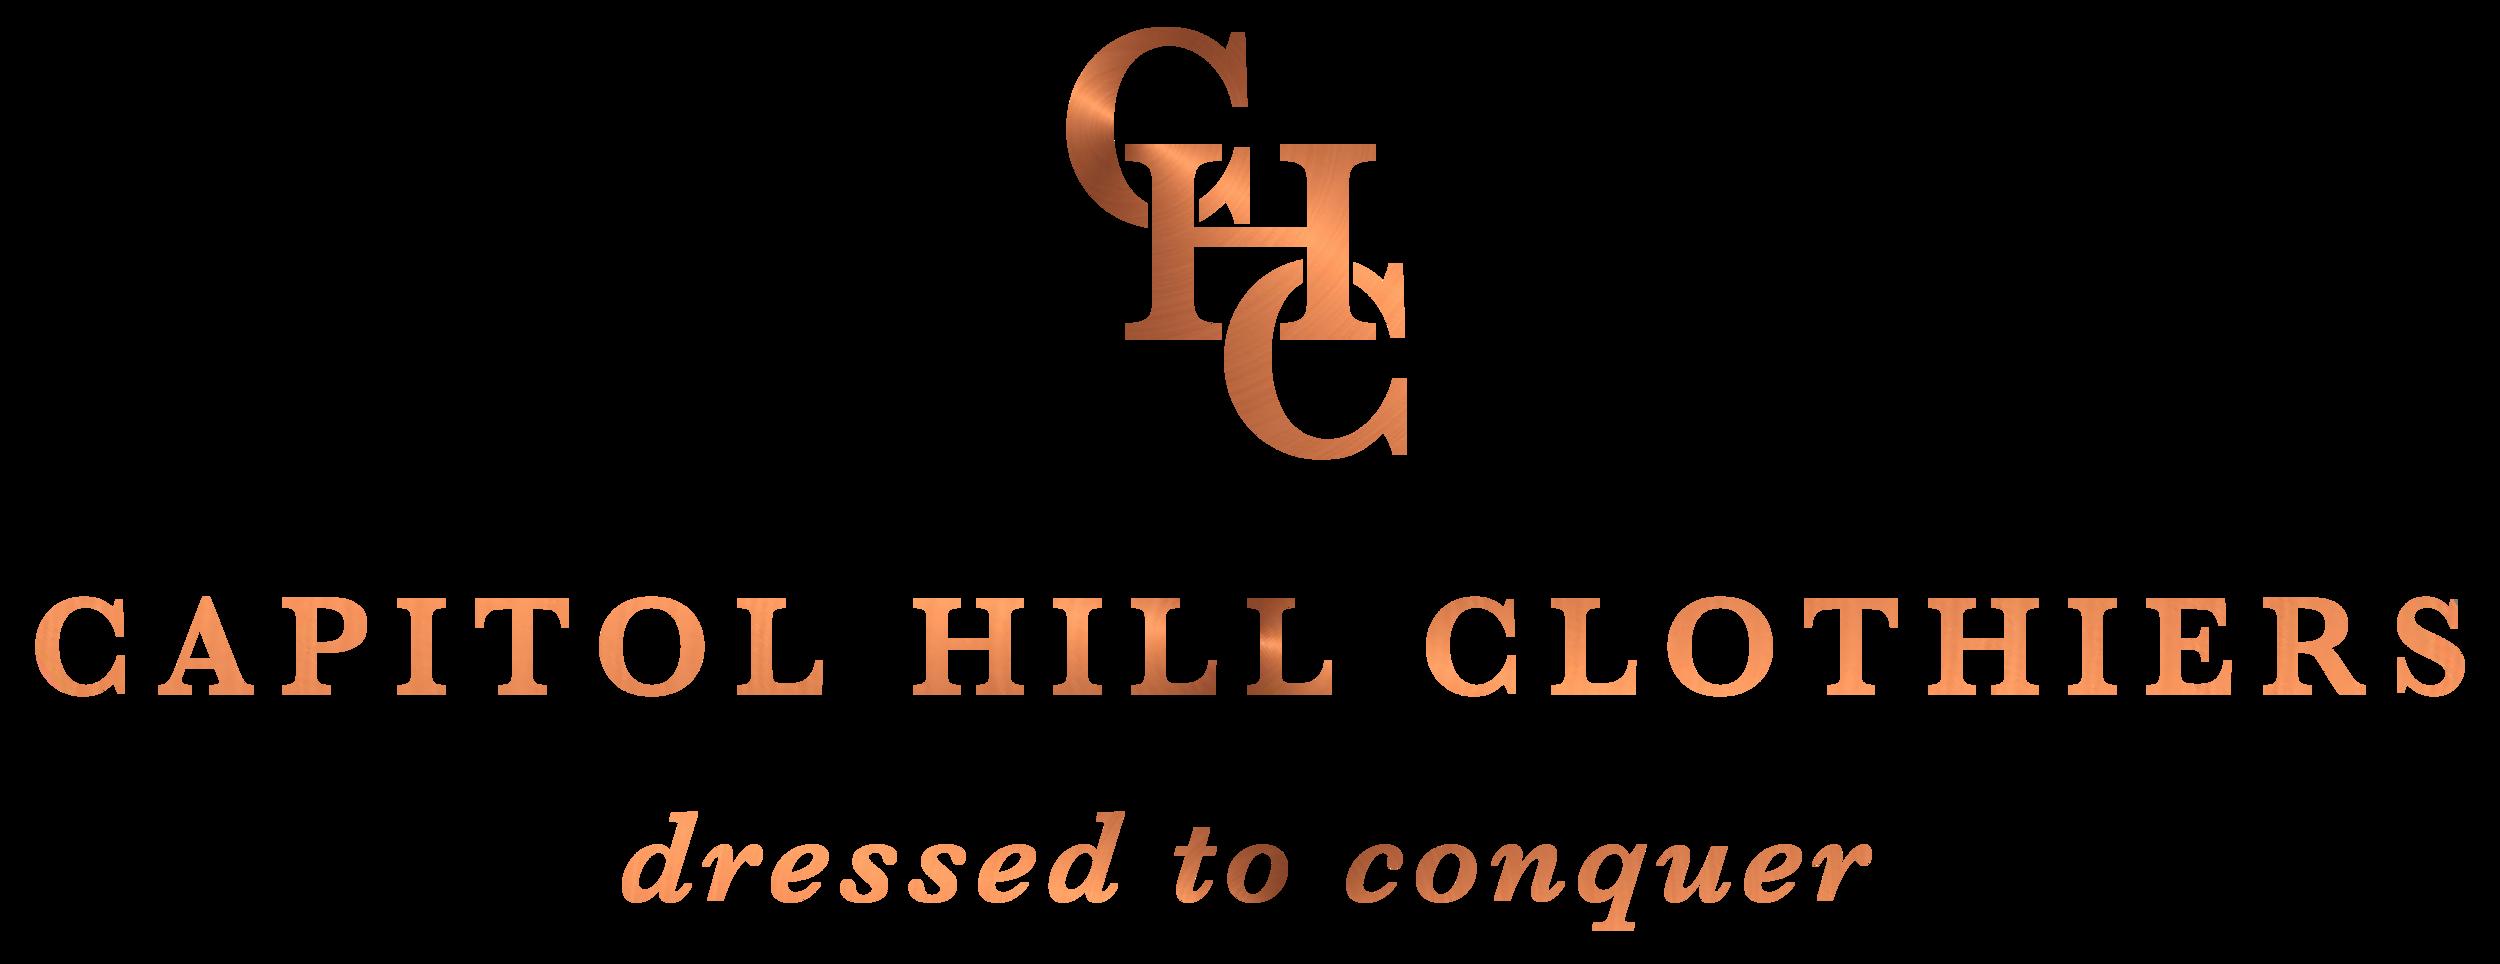 Capitol Hill Clothier Branding by Casi Long Design | casilong.com